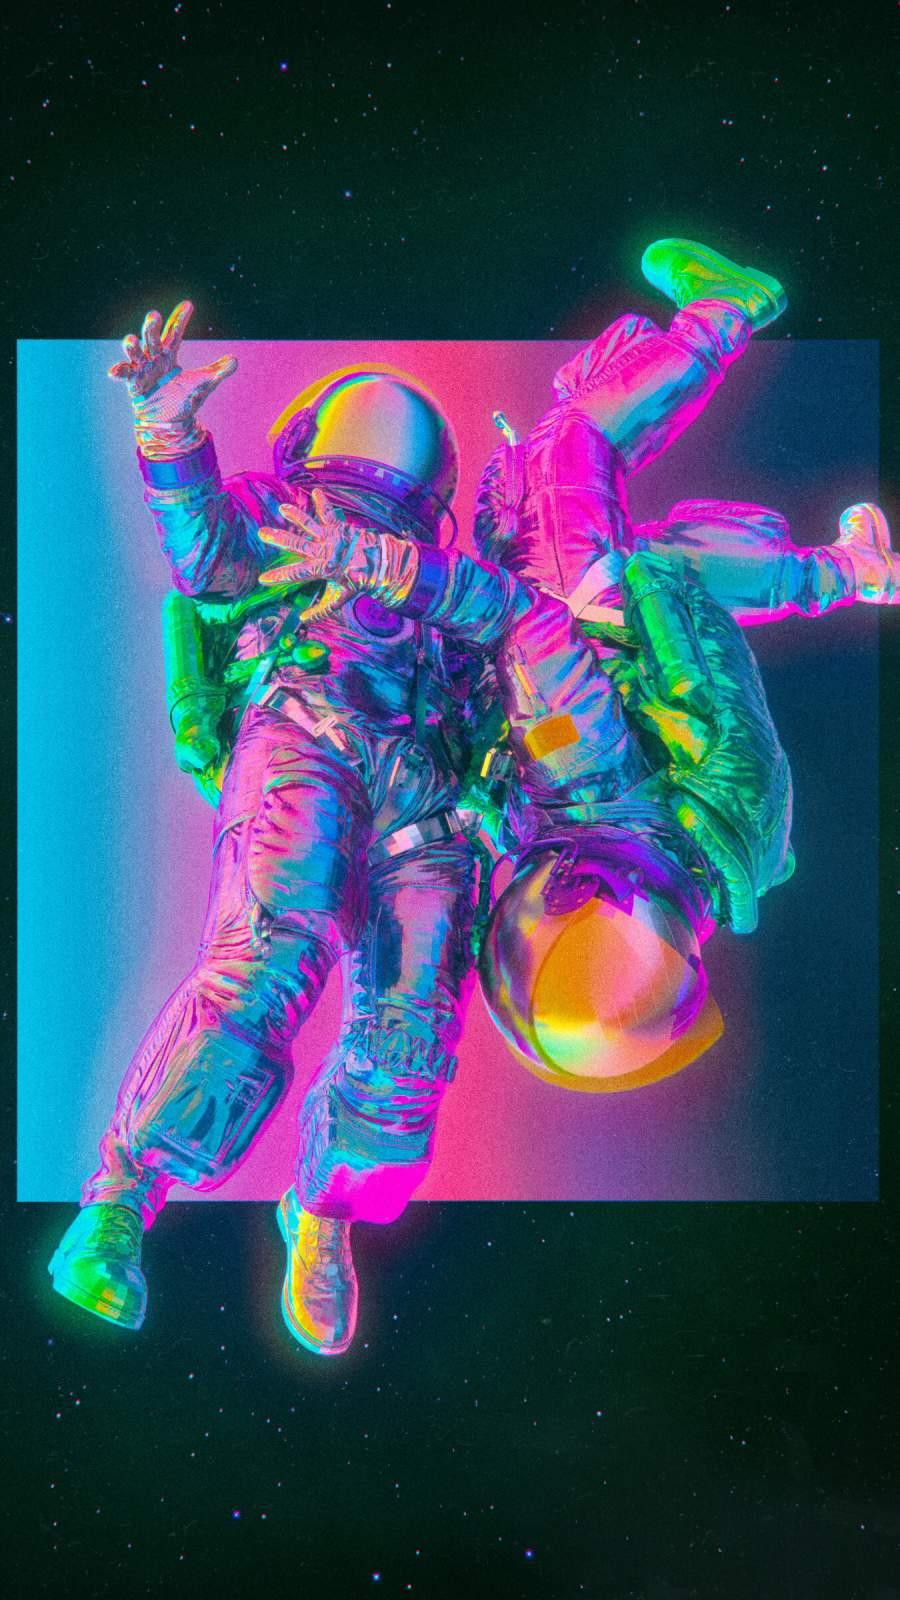 Freefall Astronaut iPhone Wallpaper